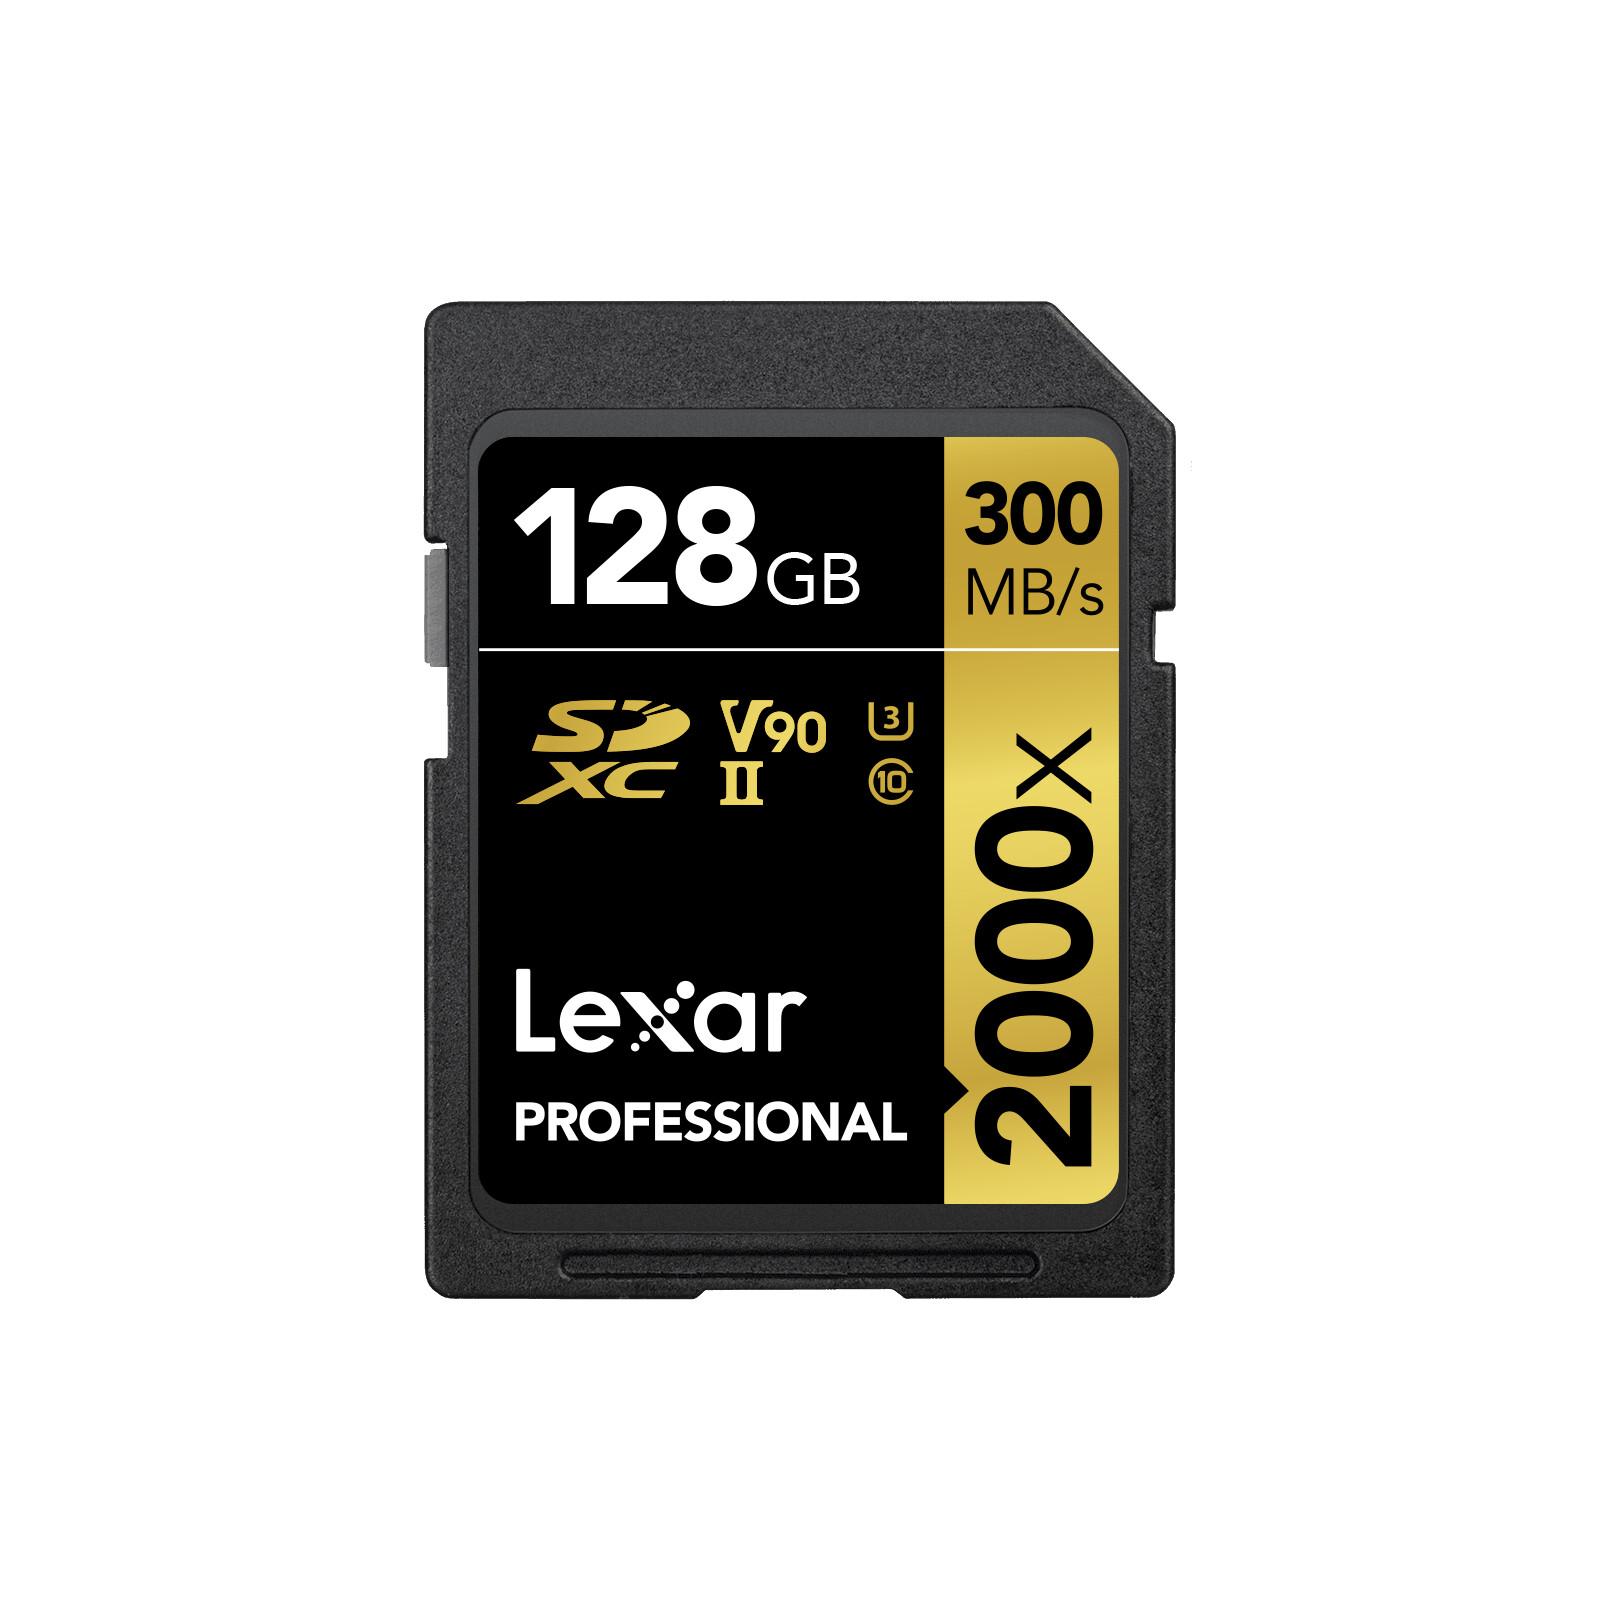 Lexar SDHC 128GB Professional UHS II 300Mb/s